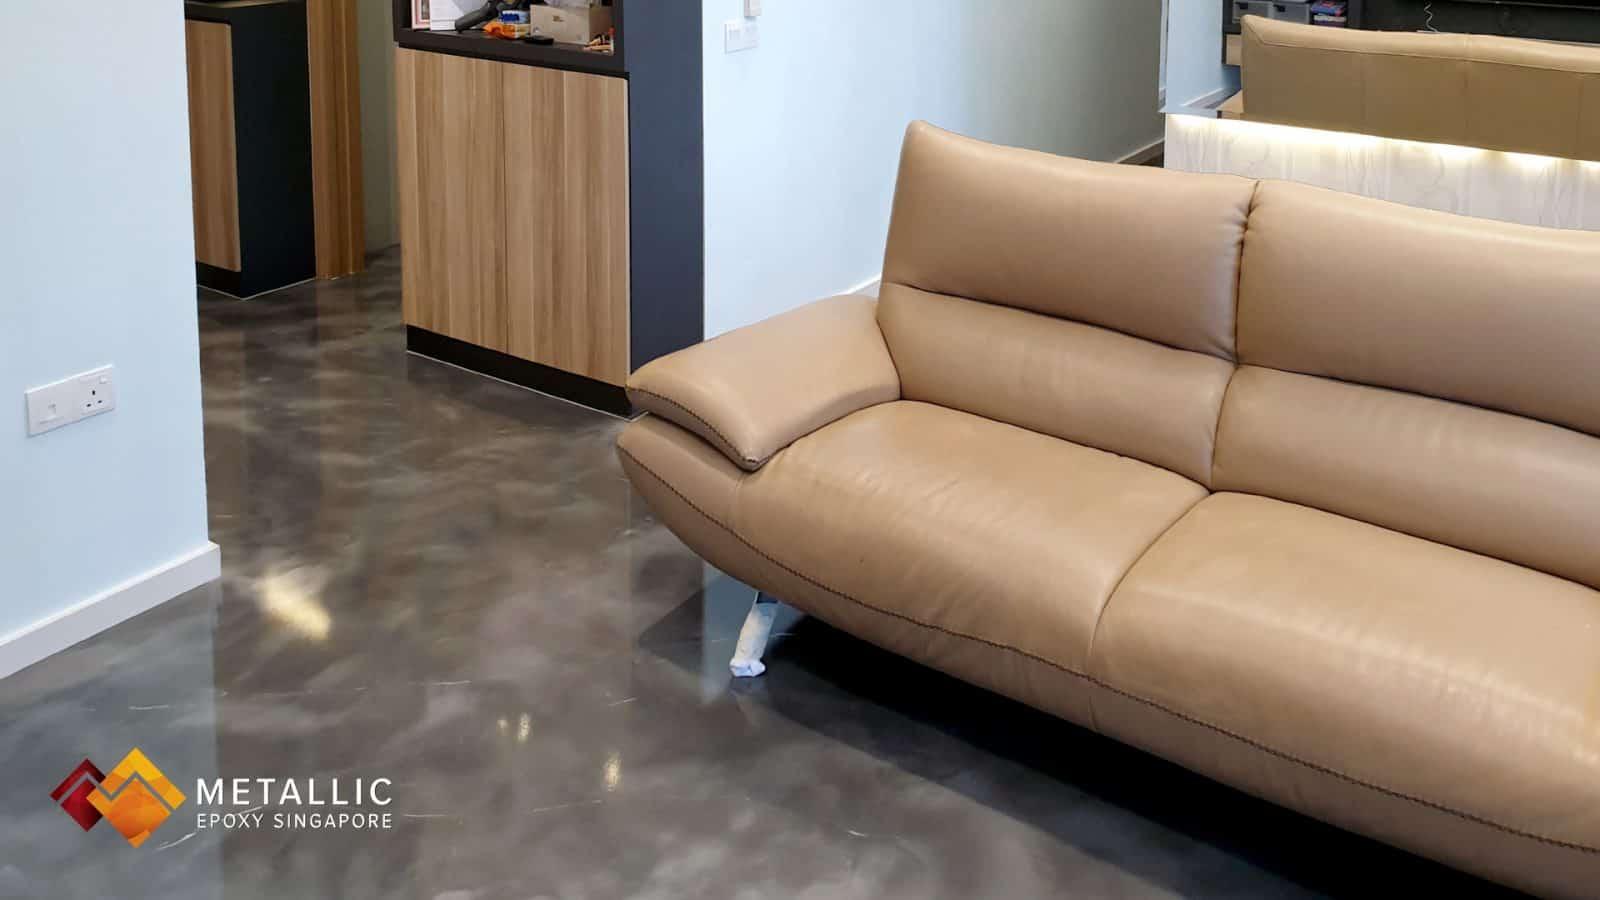 metallic epoxy singapore silver marble living room floor